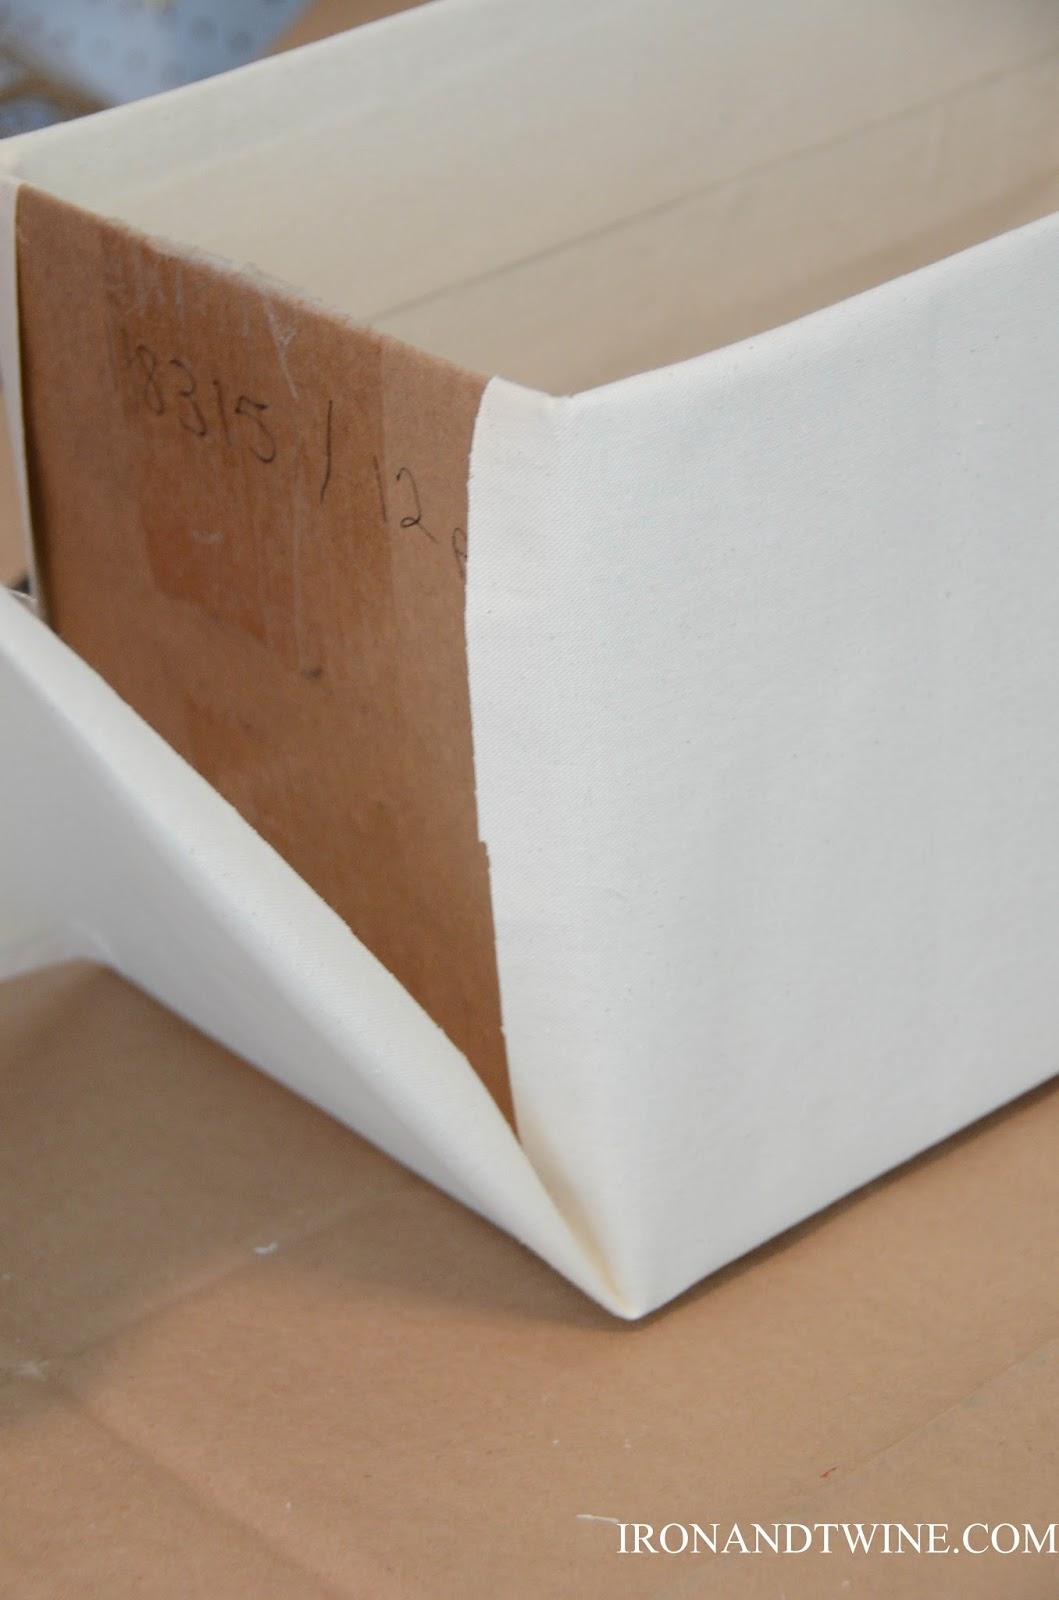 DIY+Belt+Handled+Box,+DIY+fabric+covered+box,+Iron+and+Twine+(26).jpg